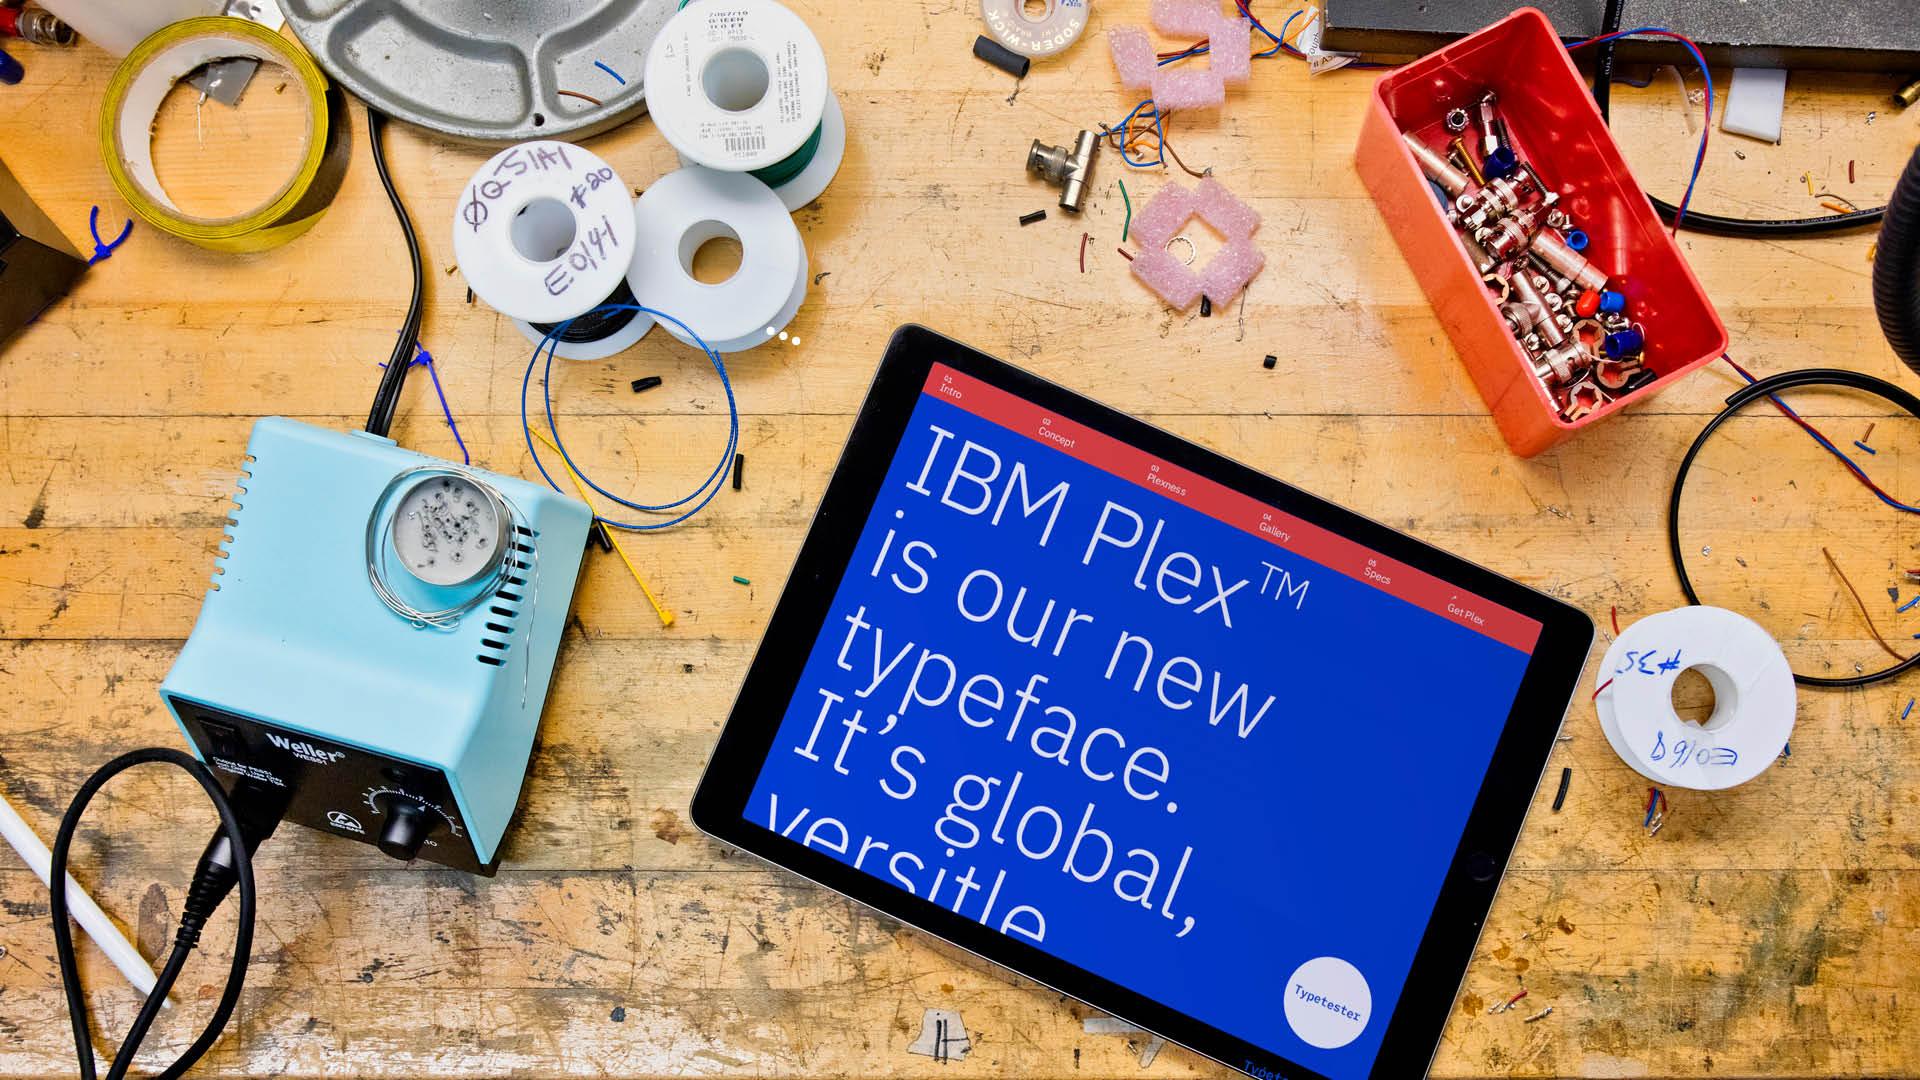 06 IBM Plex Microsite - Anthony Zukofsky